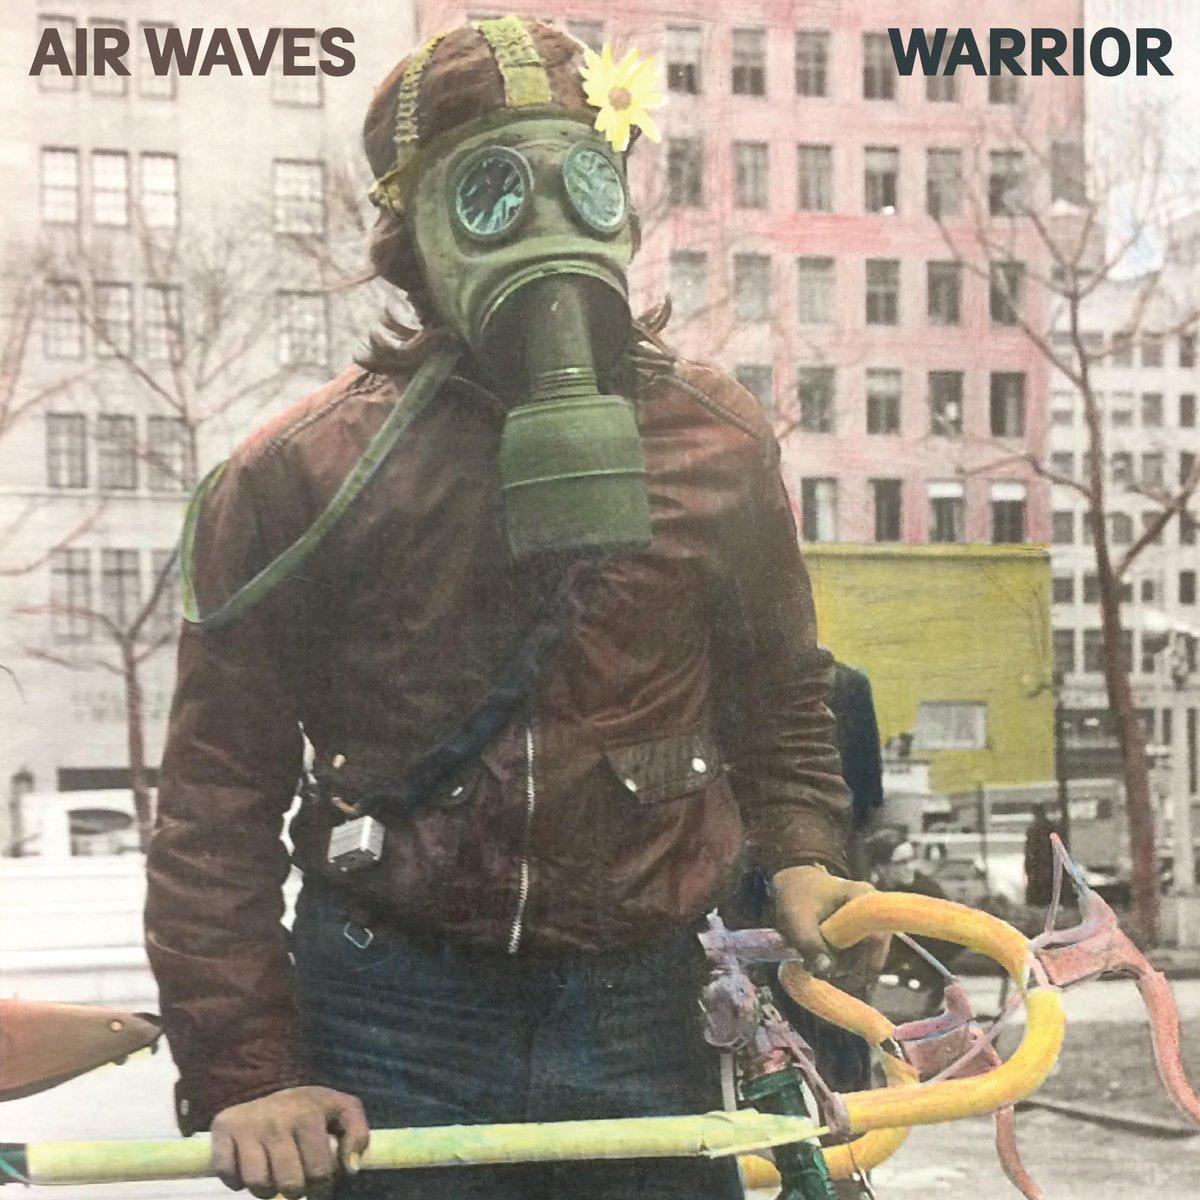 Listen to @Air_Waves' new song 'Blue Fire' https://t.co/bRlSjXykjb https://t.co/oPAkRNkyZJ